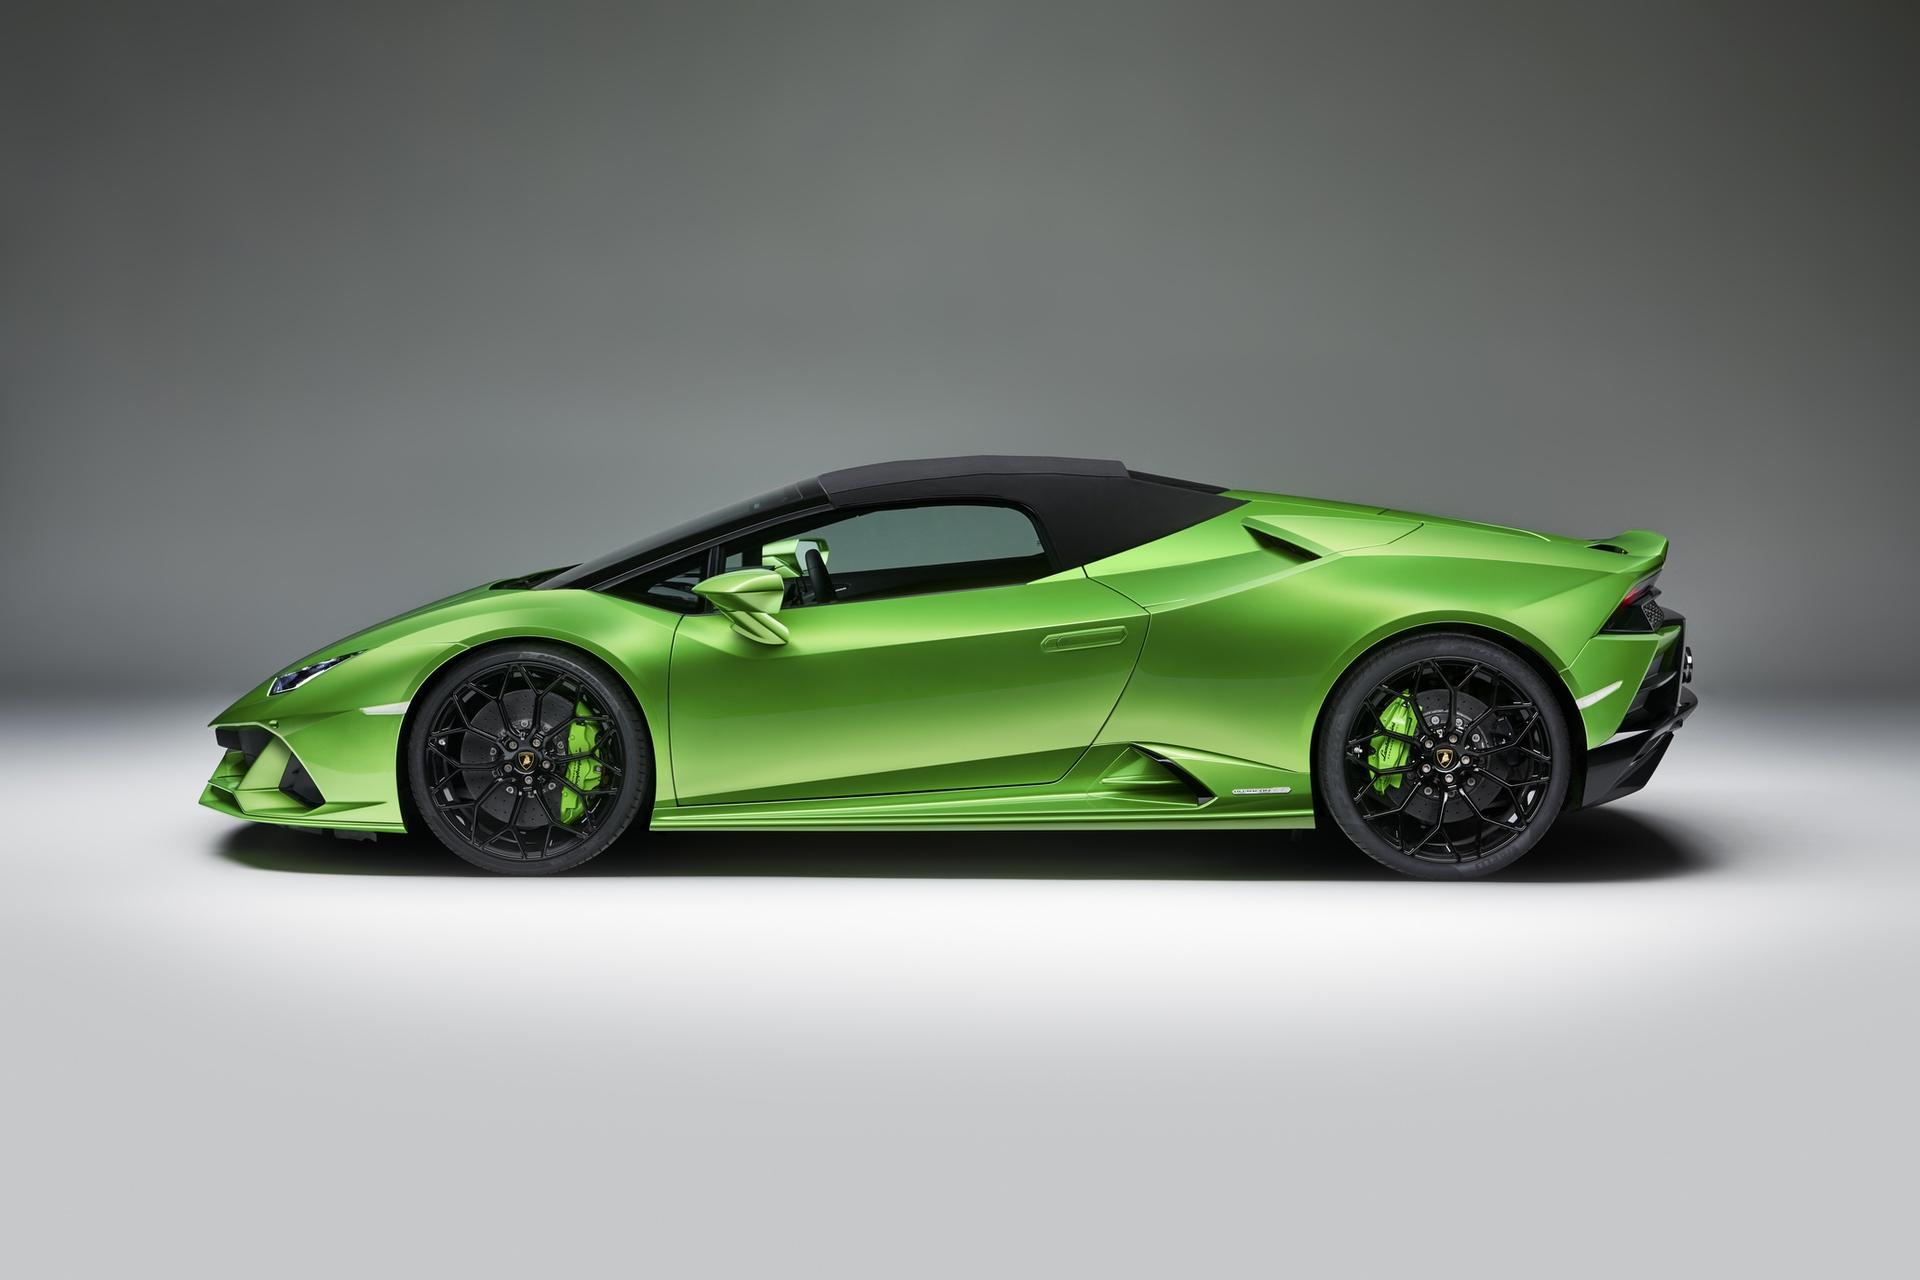 Lamborghini_Huracan_Evo_Spyder_0005